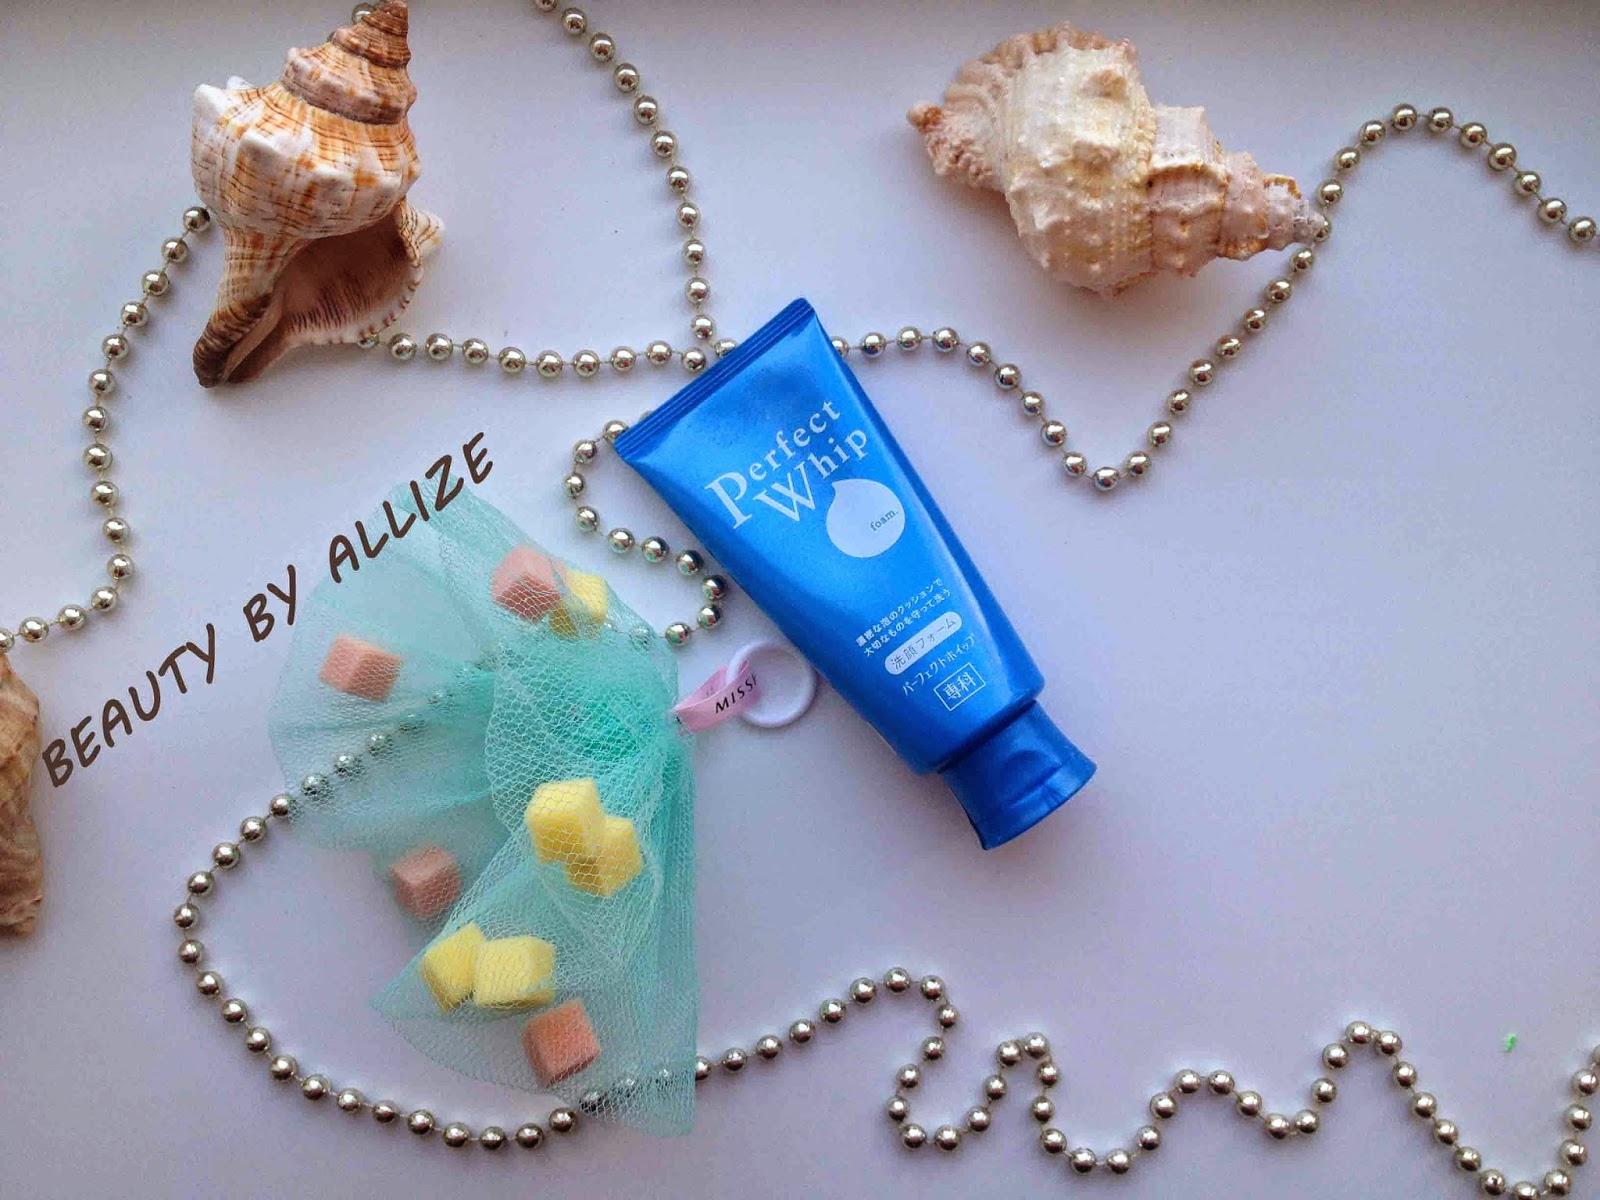 Пенка для умывания Shiseido Perfect Whip Foam. Aziatskaja kosmetika.